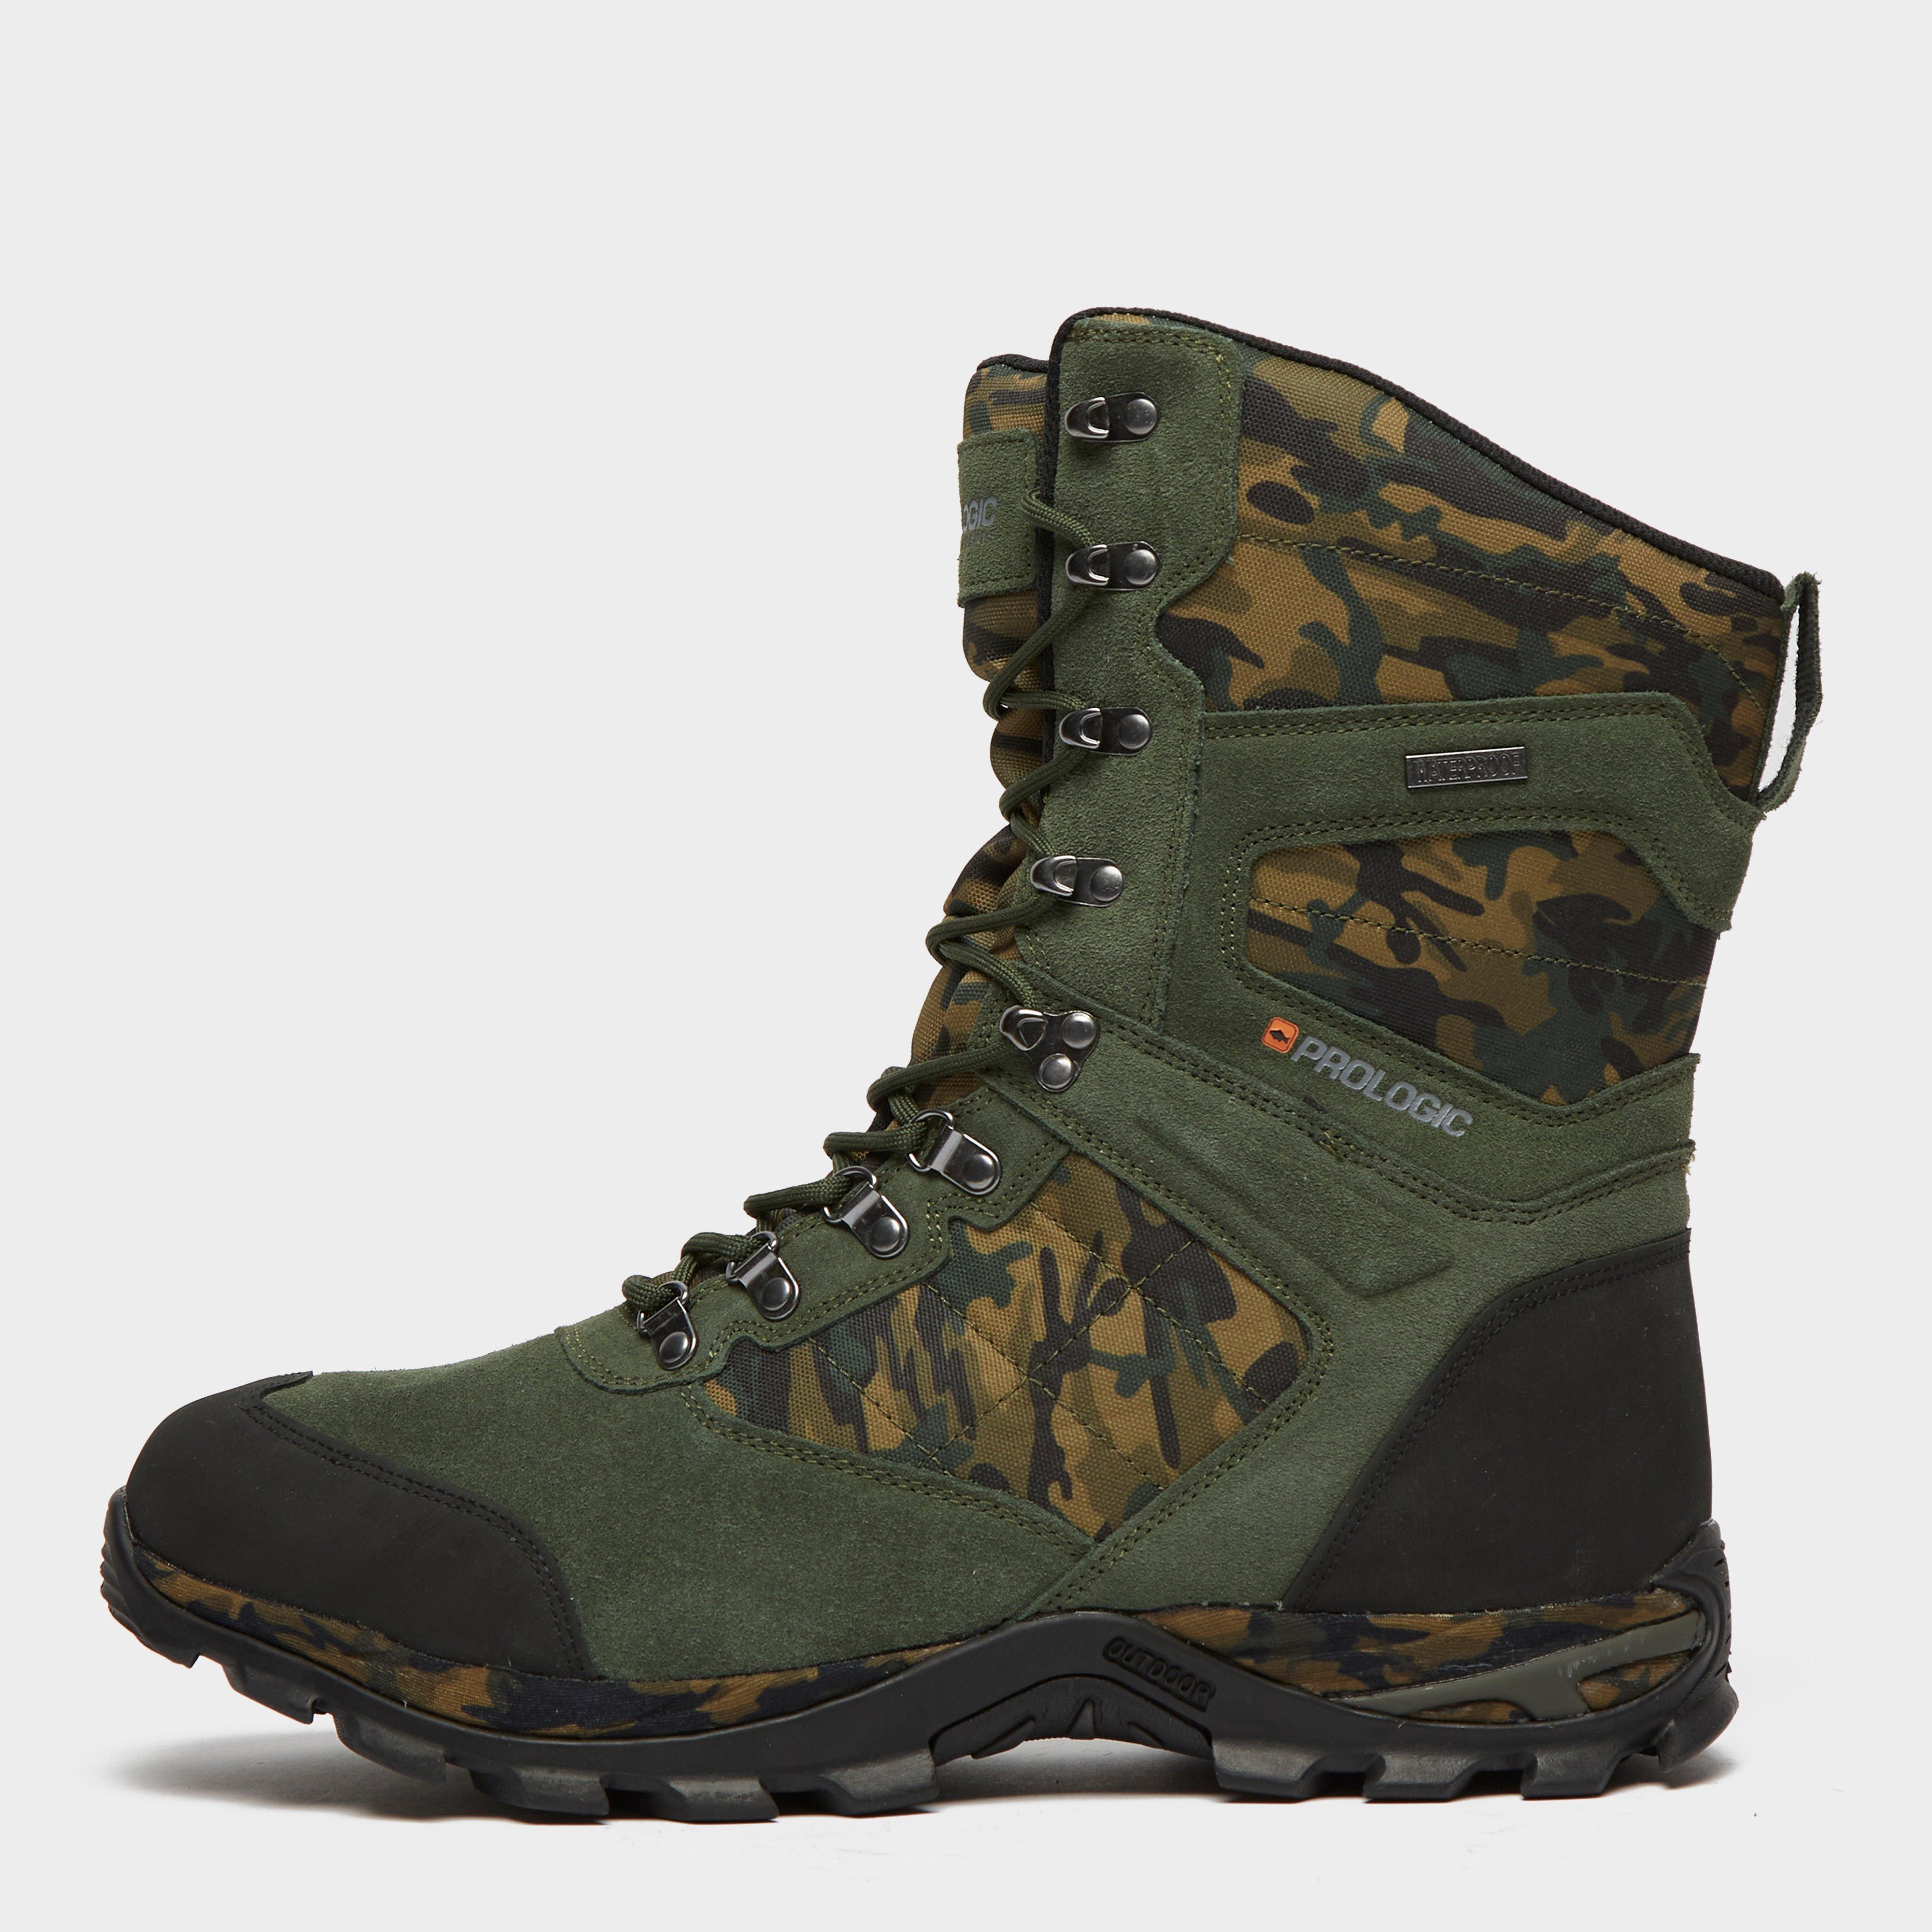 Prologic Prologic Bank Bound Camo Trek High Boot -